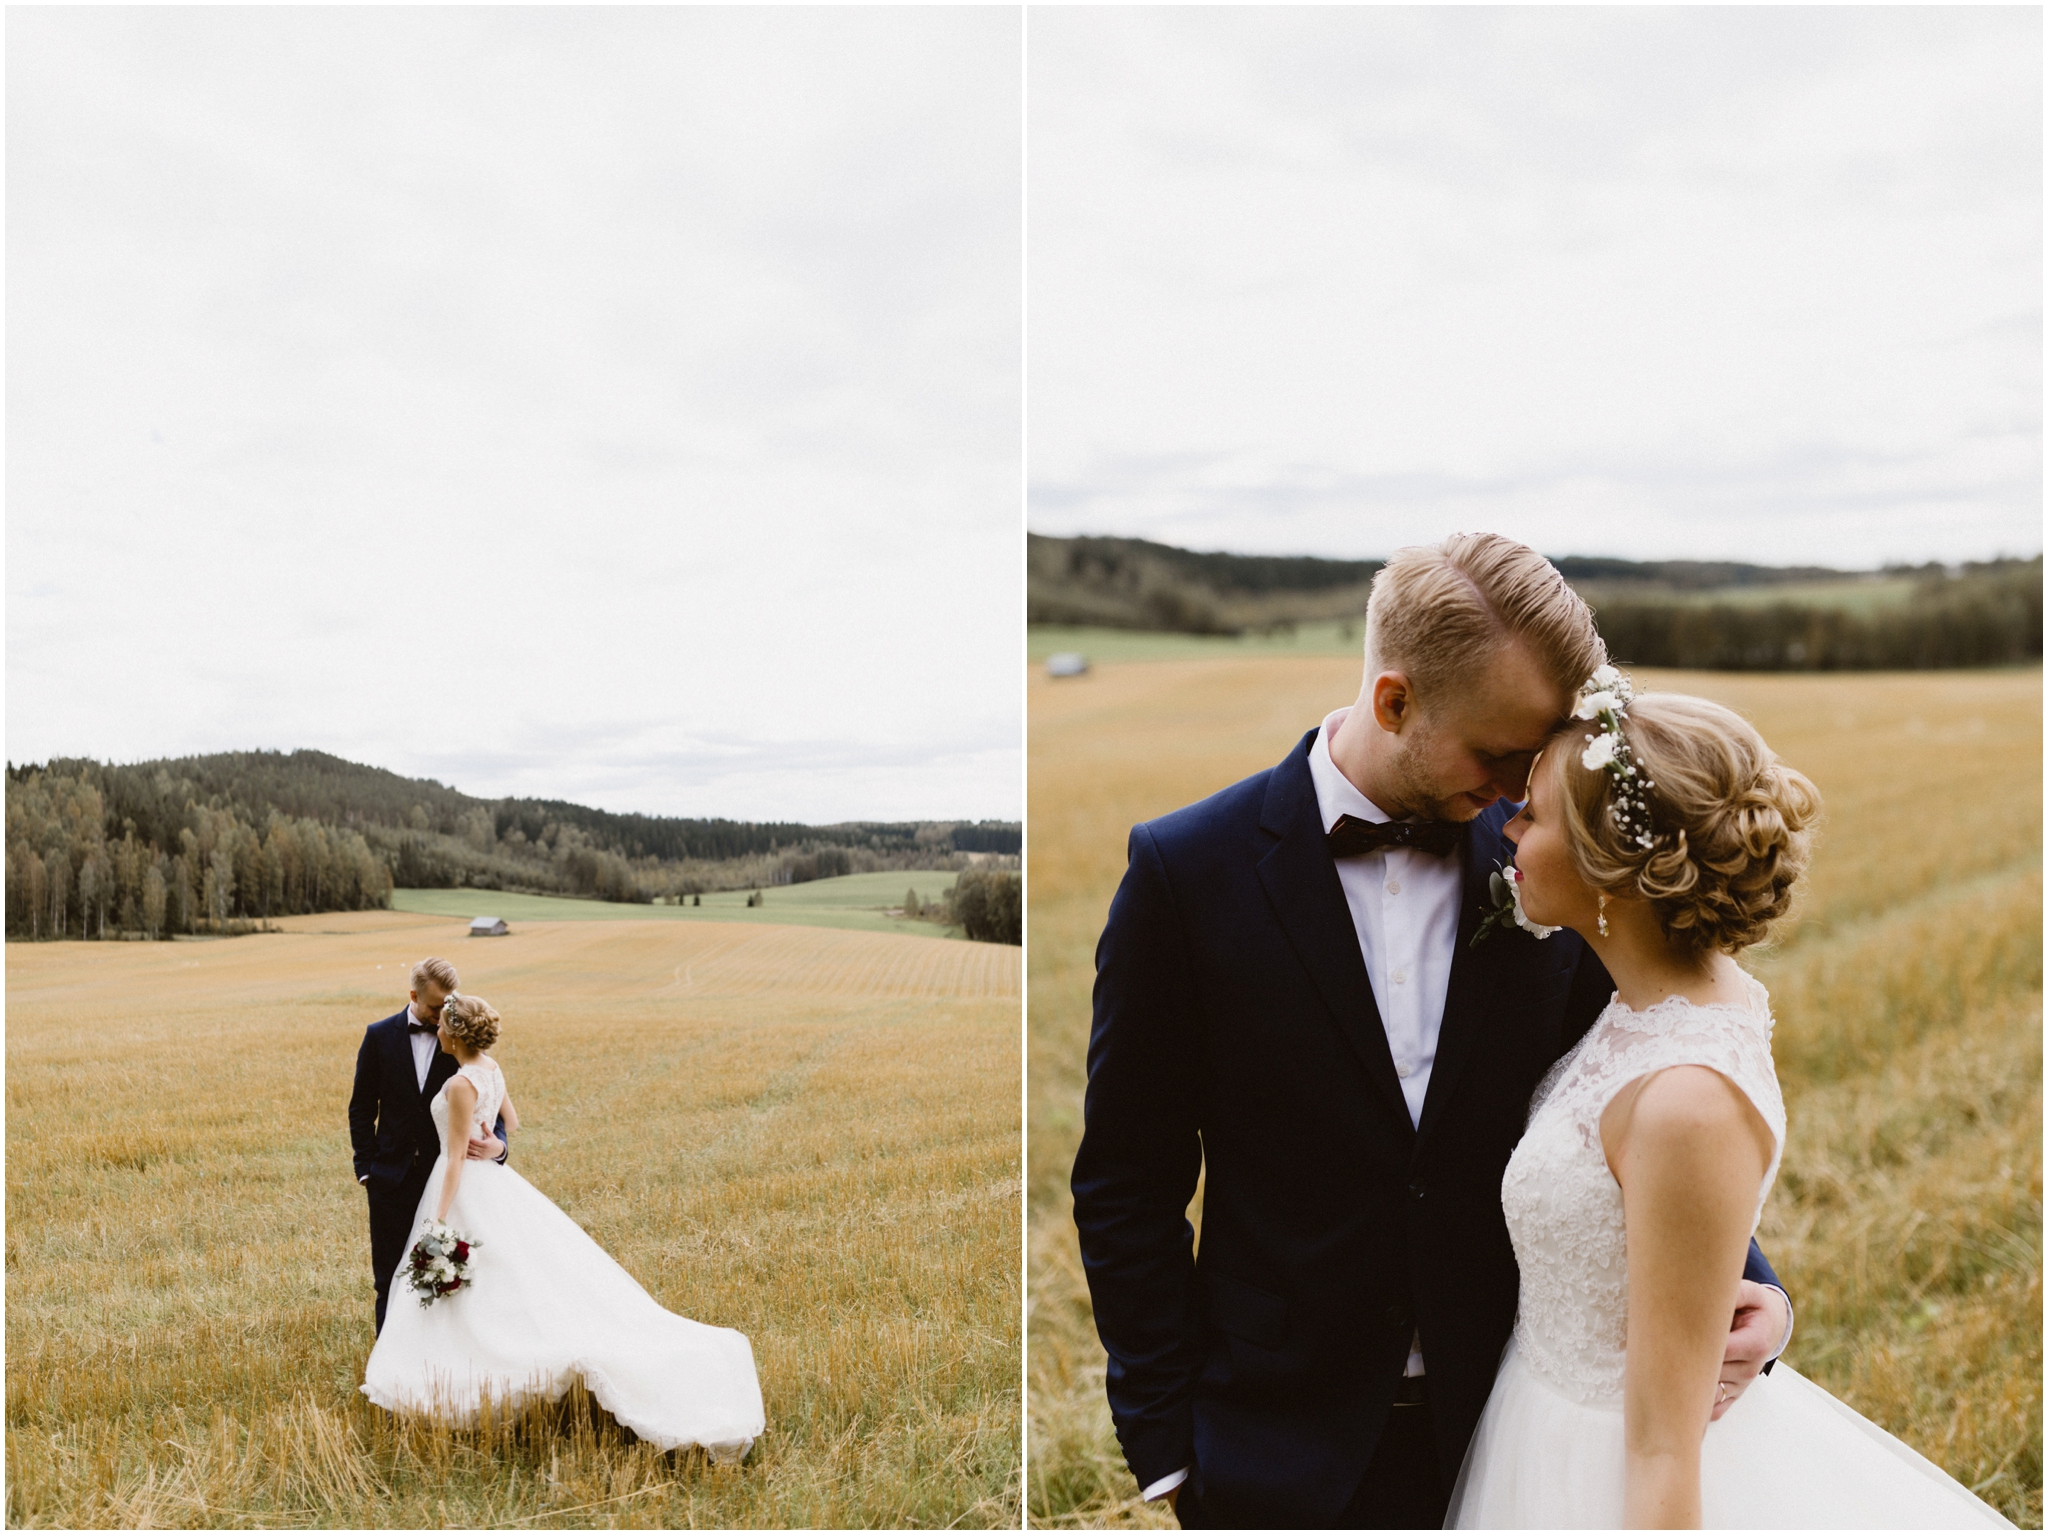 Leevi + Susanna -- Patrick Karkkolainen Wedding Photographer + Adventurer-121.jpg